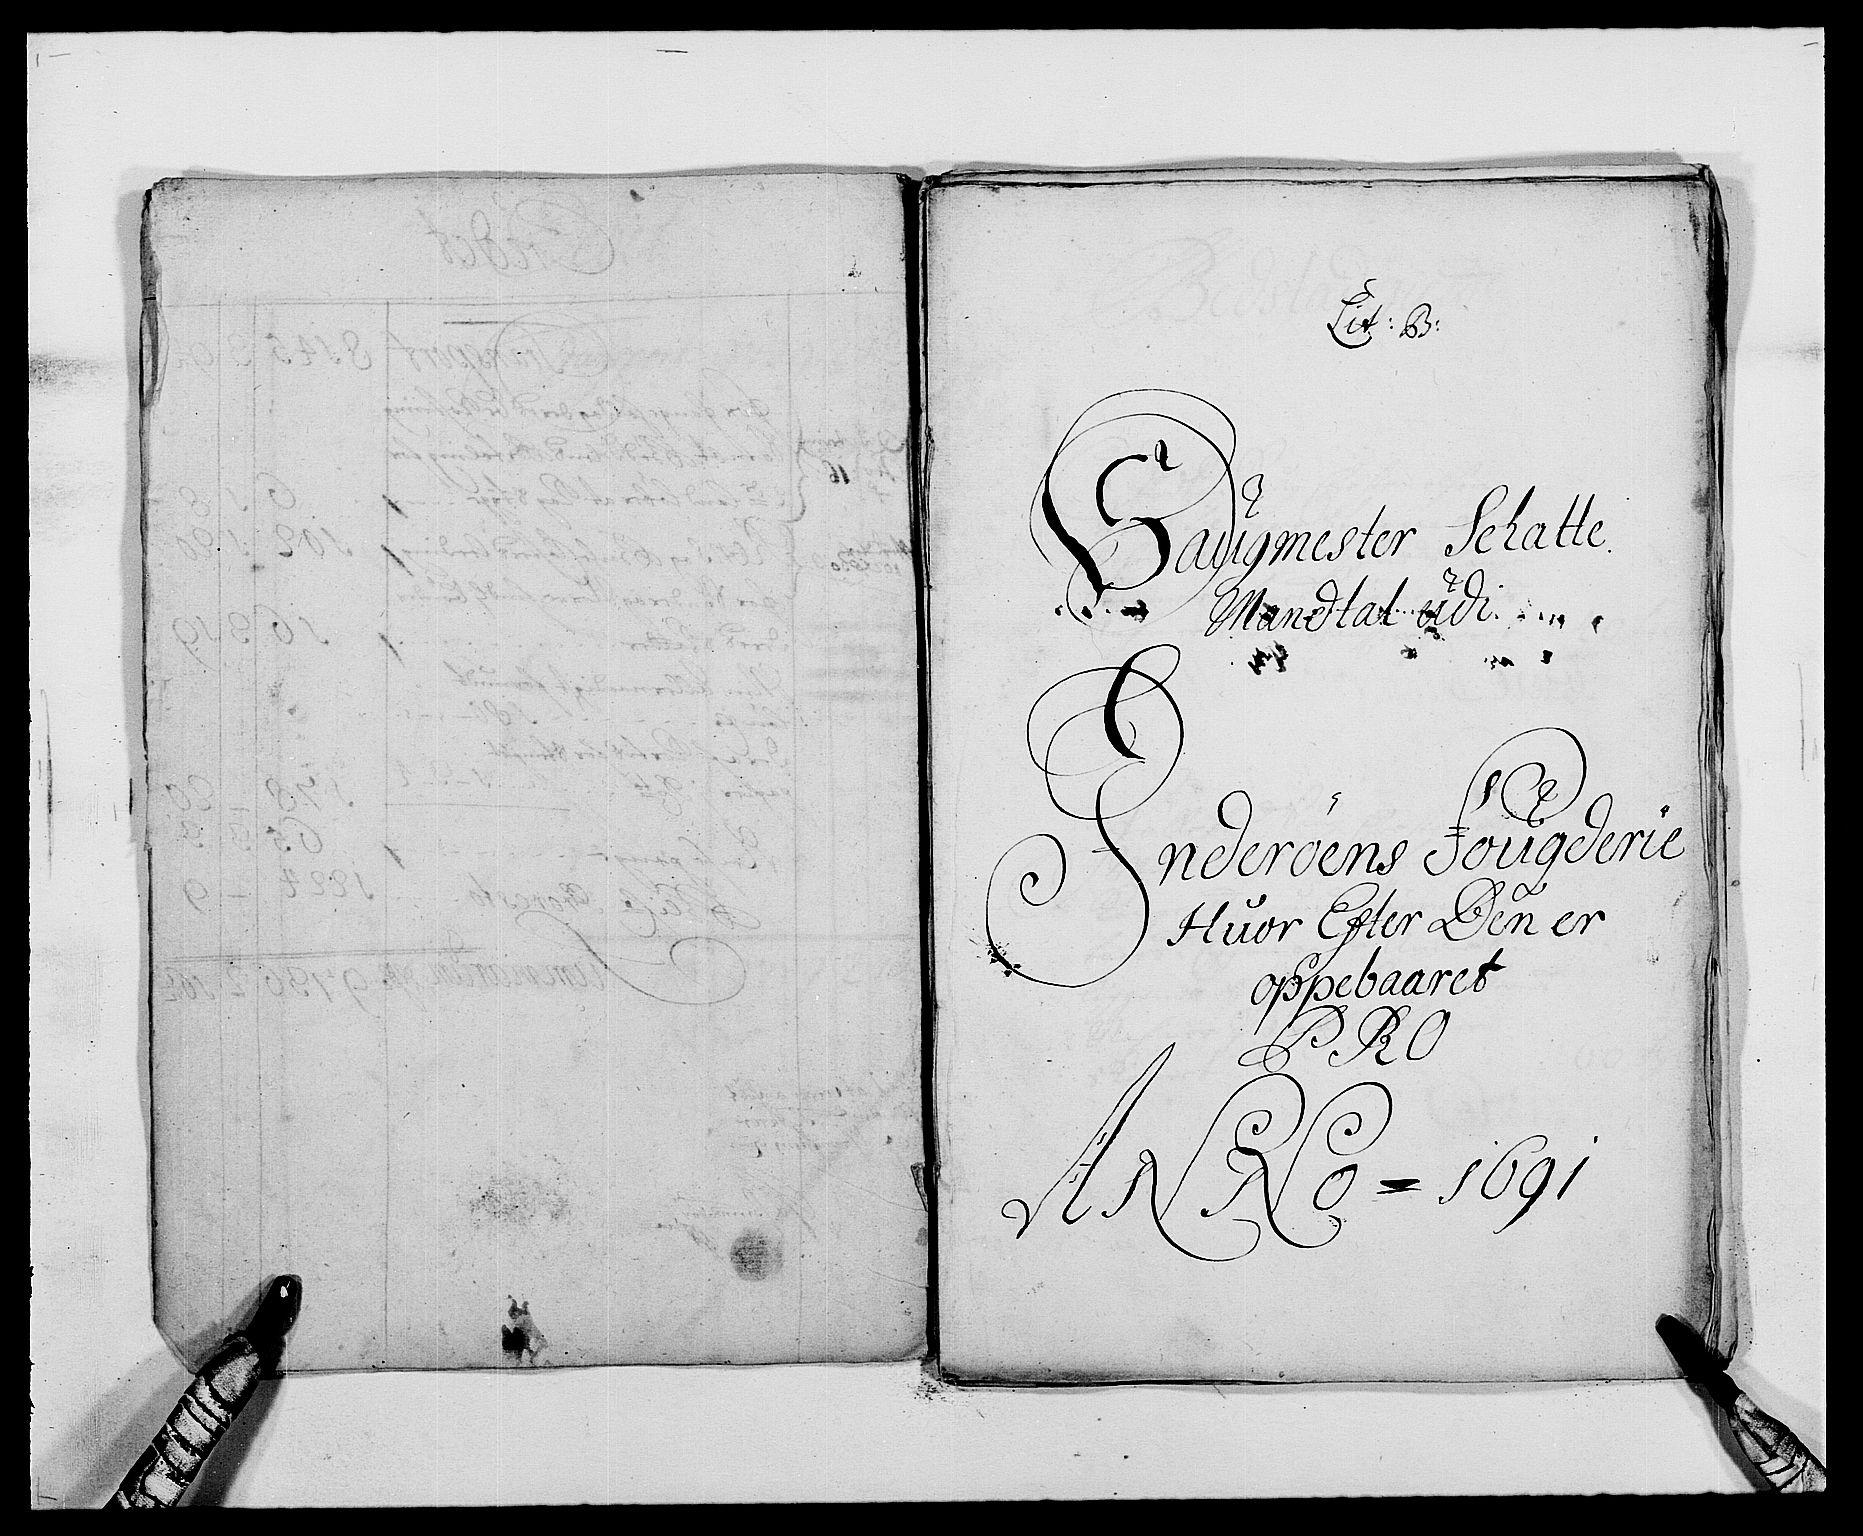 RA, Rentekammeret inntil 1814, Reviderte regnskaper, Fogderegnskap, R63/L4307: Fogderegnskap Inderøy, 1690-1691, s. 292